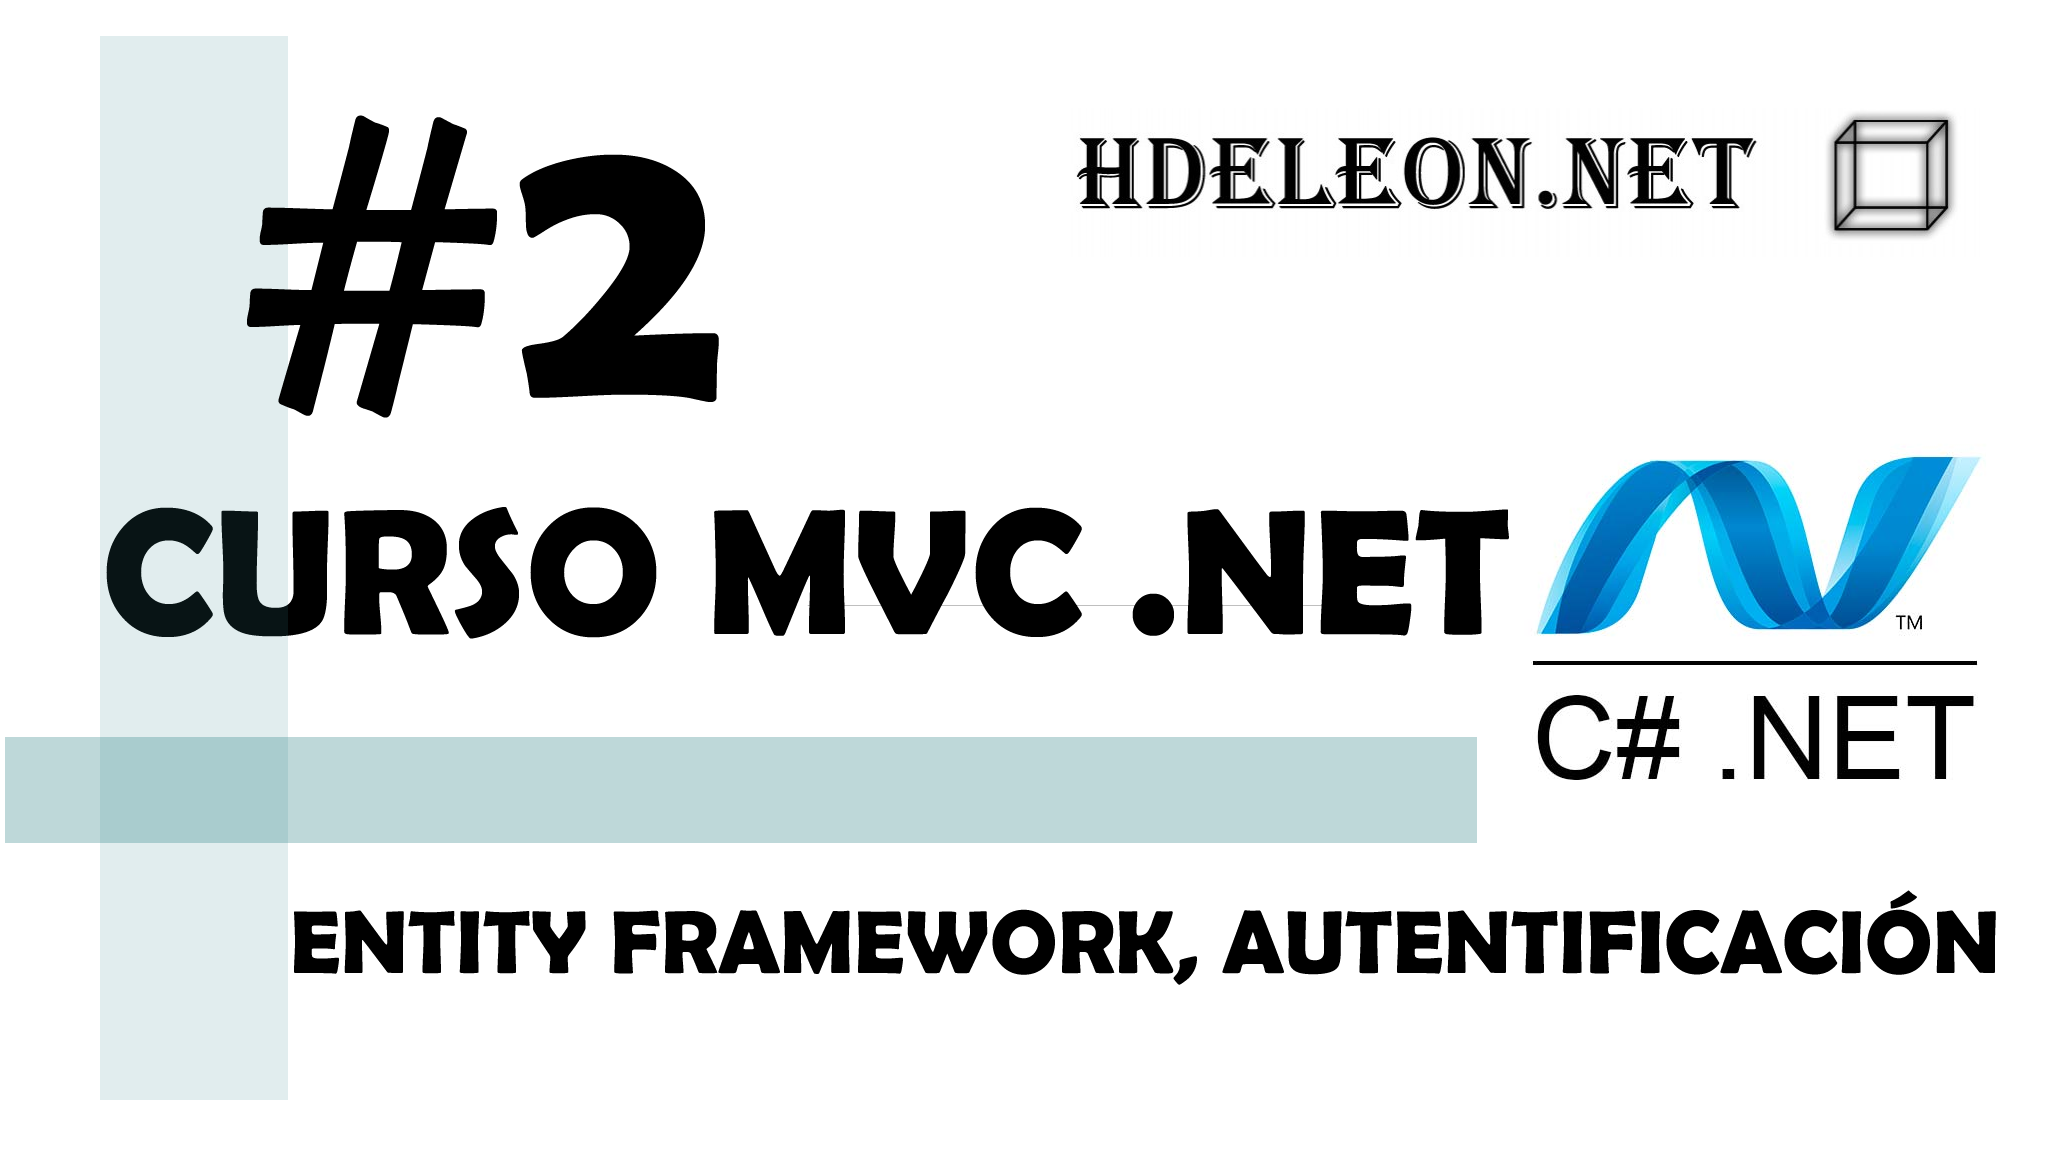 Curso de MVC .Net C# Entity Framework, autentificación #2